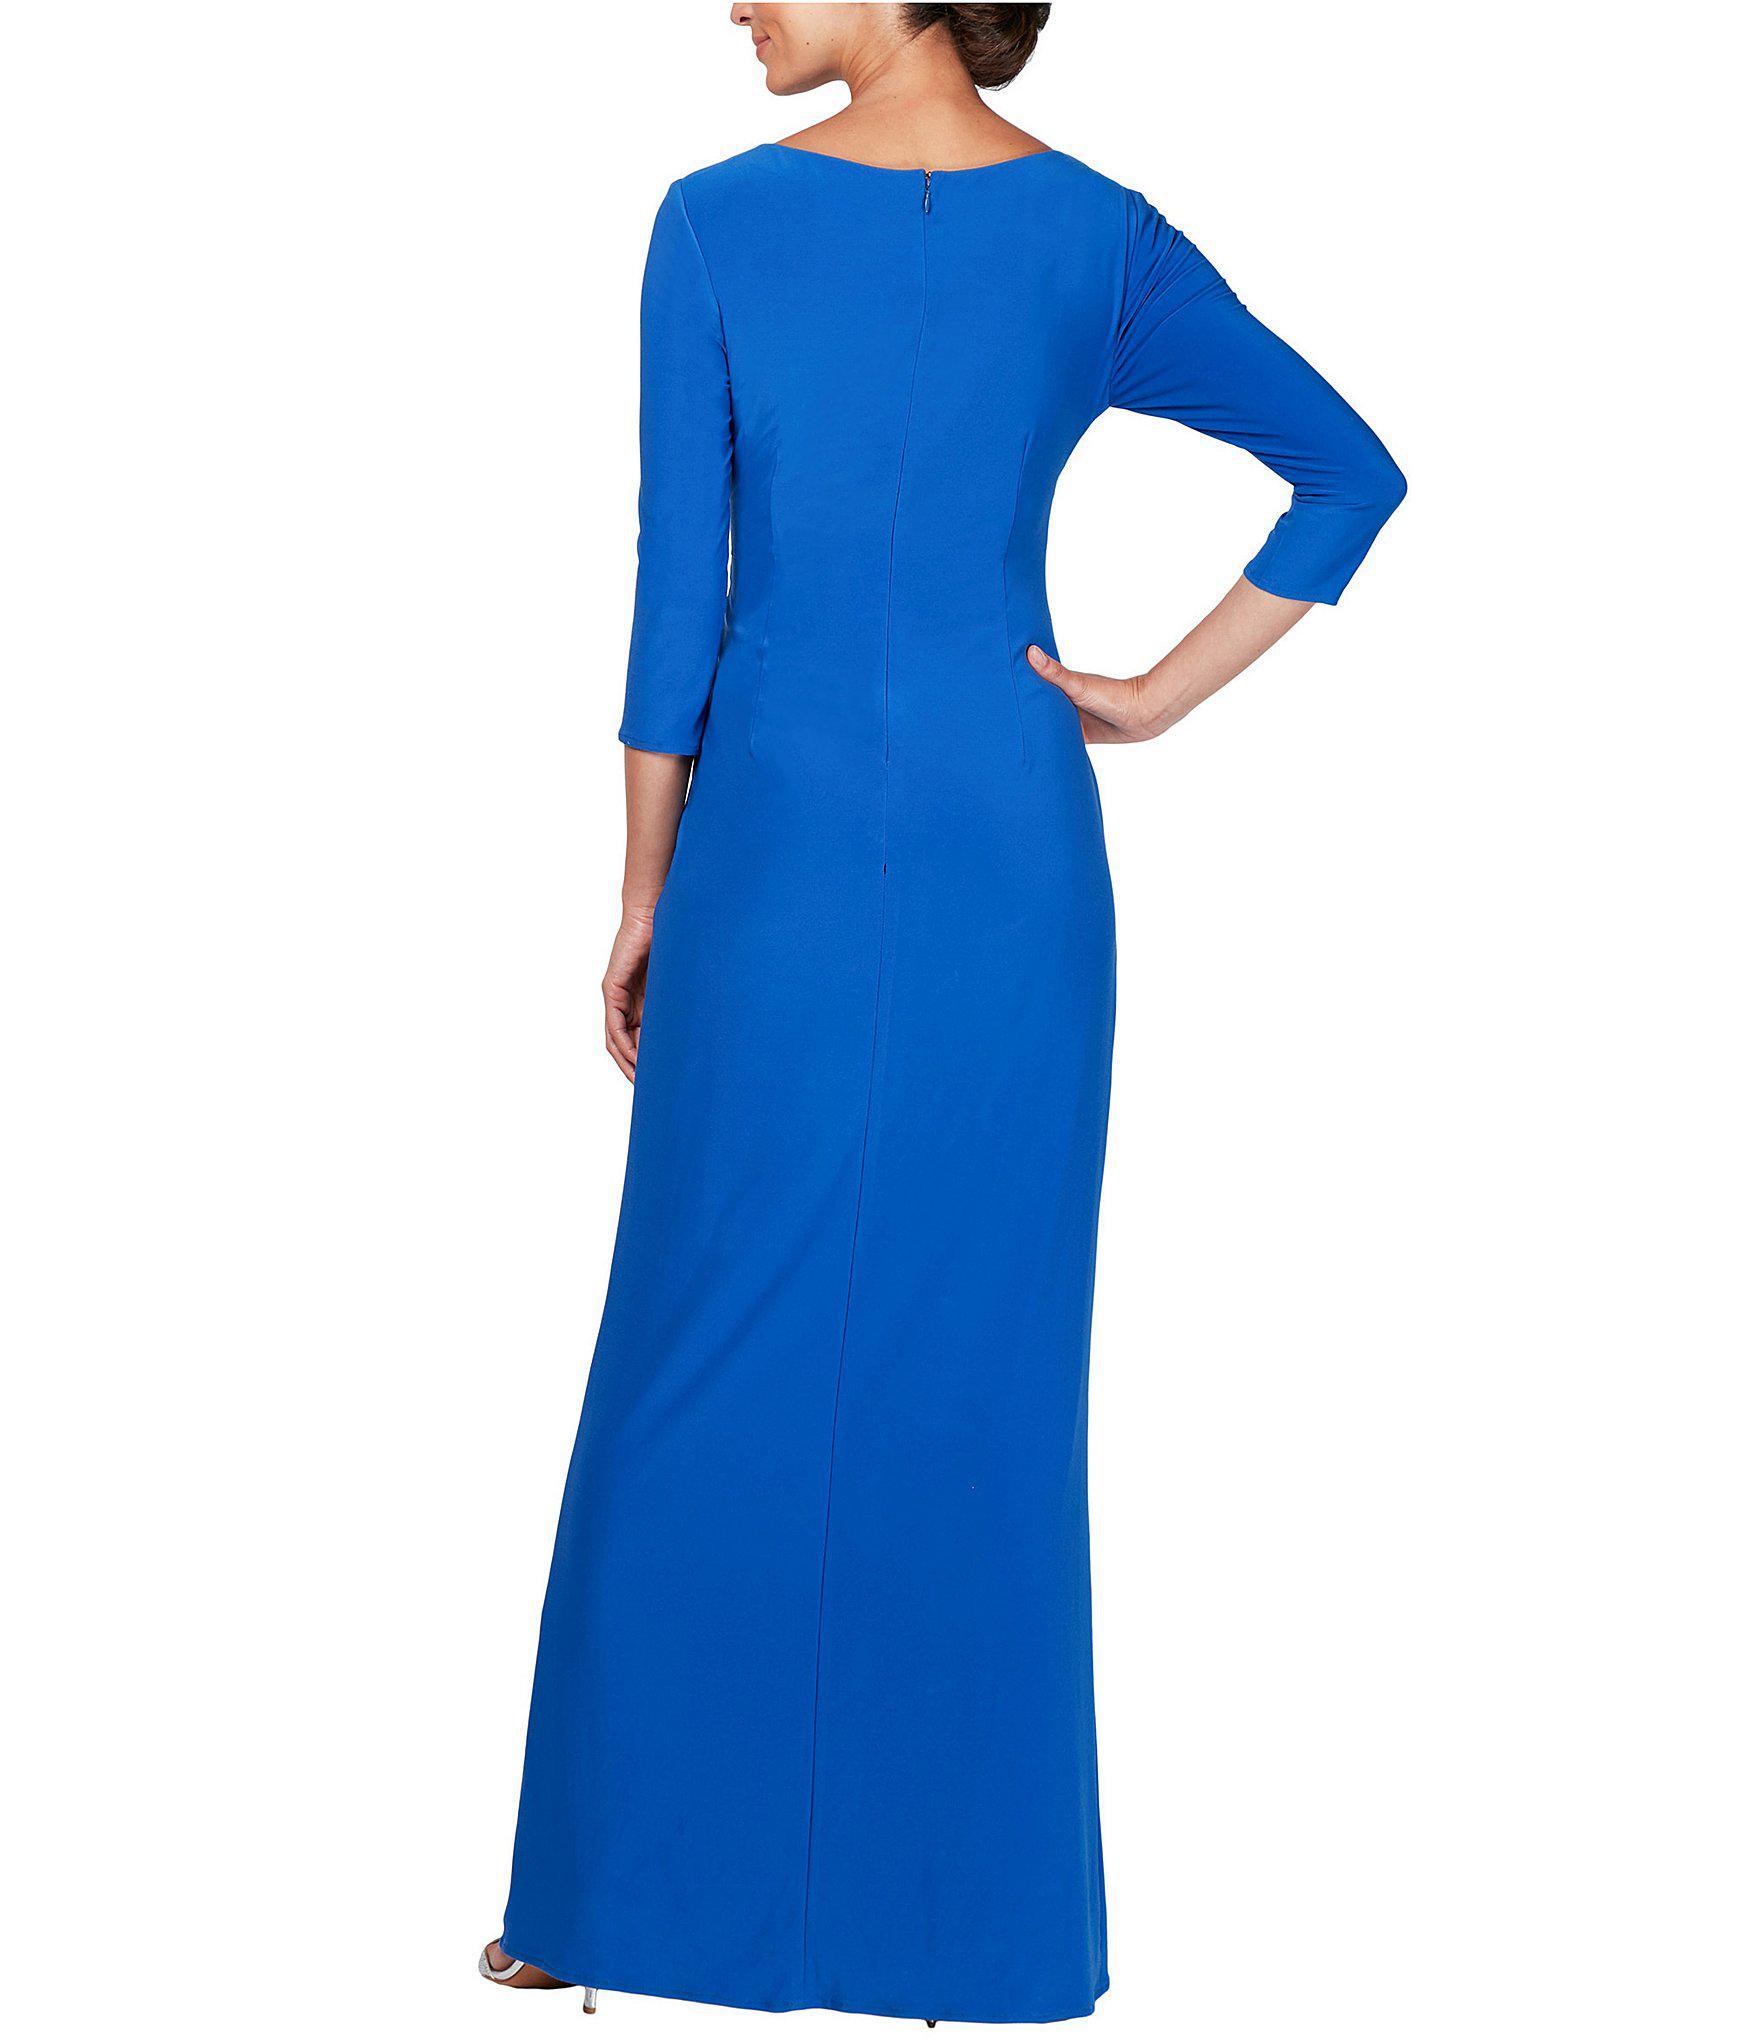 14303a41797 Alex Evenings - Blue Petite Size V-neck Embellished Waist Draped Long  A-line. View fullscreen